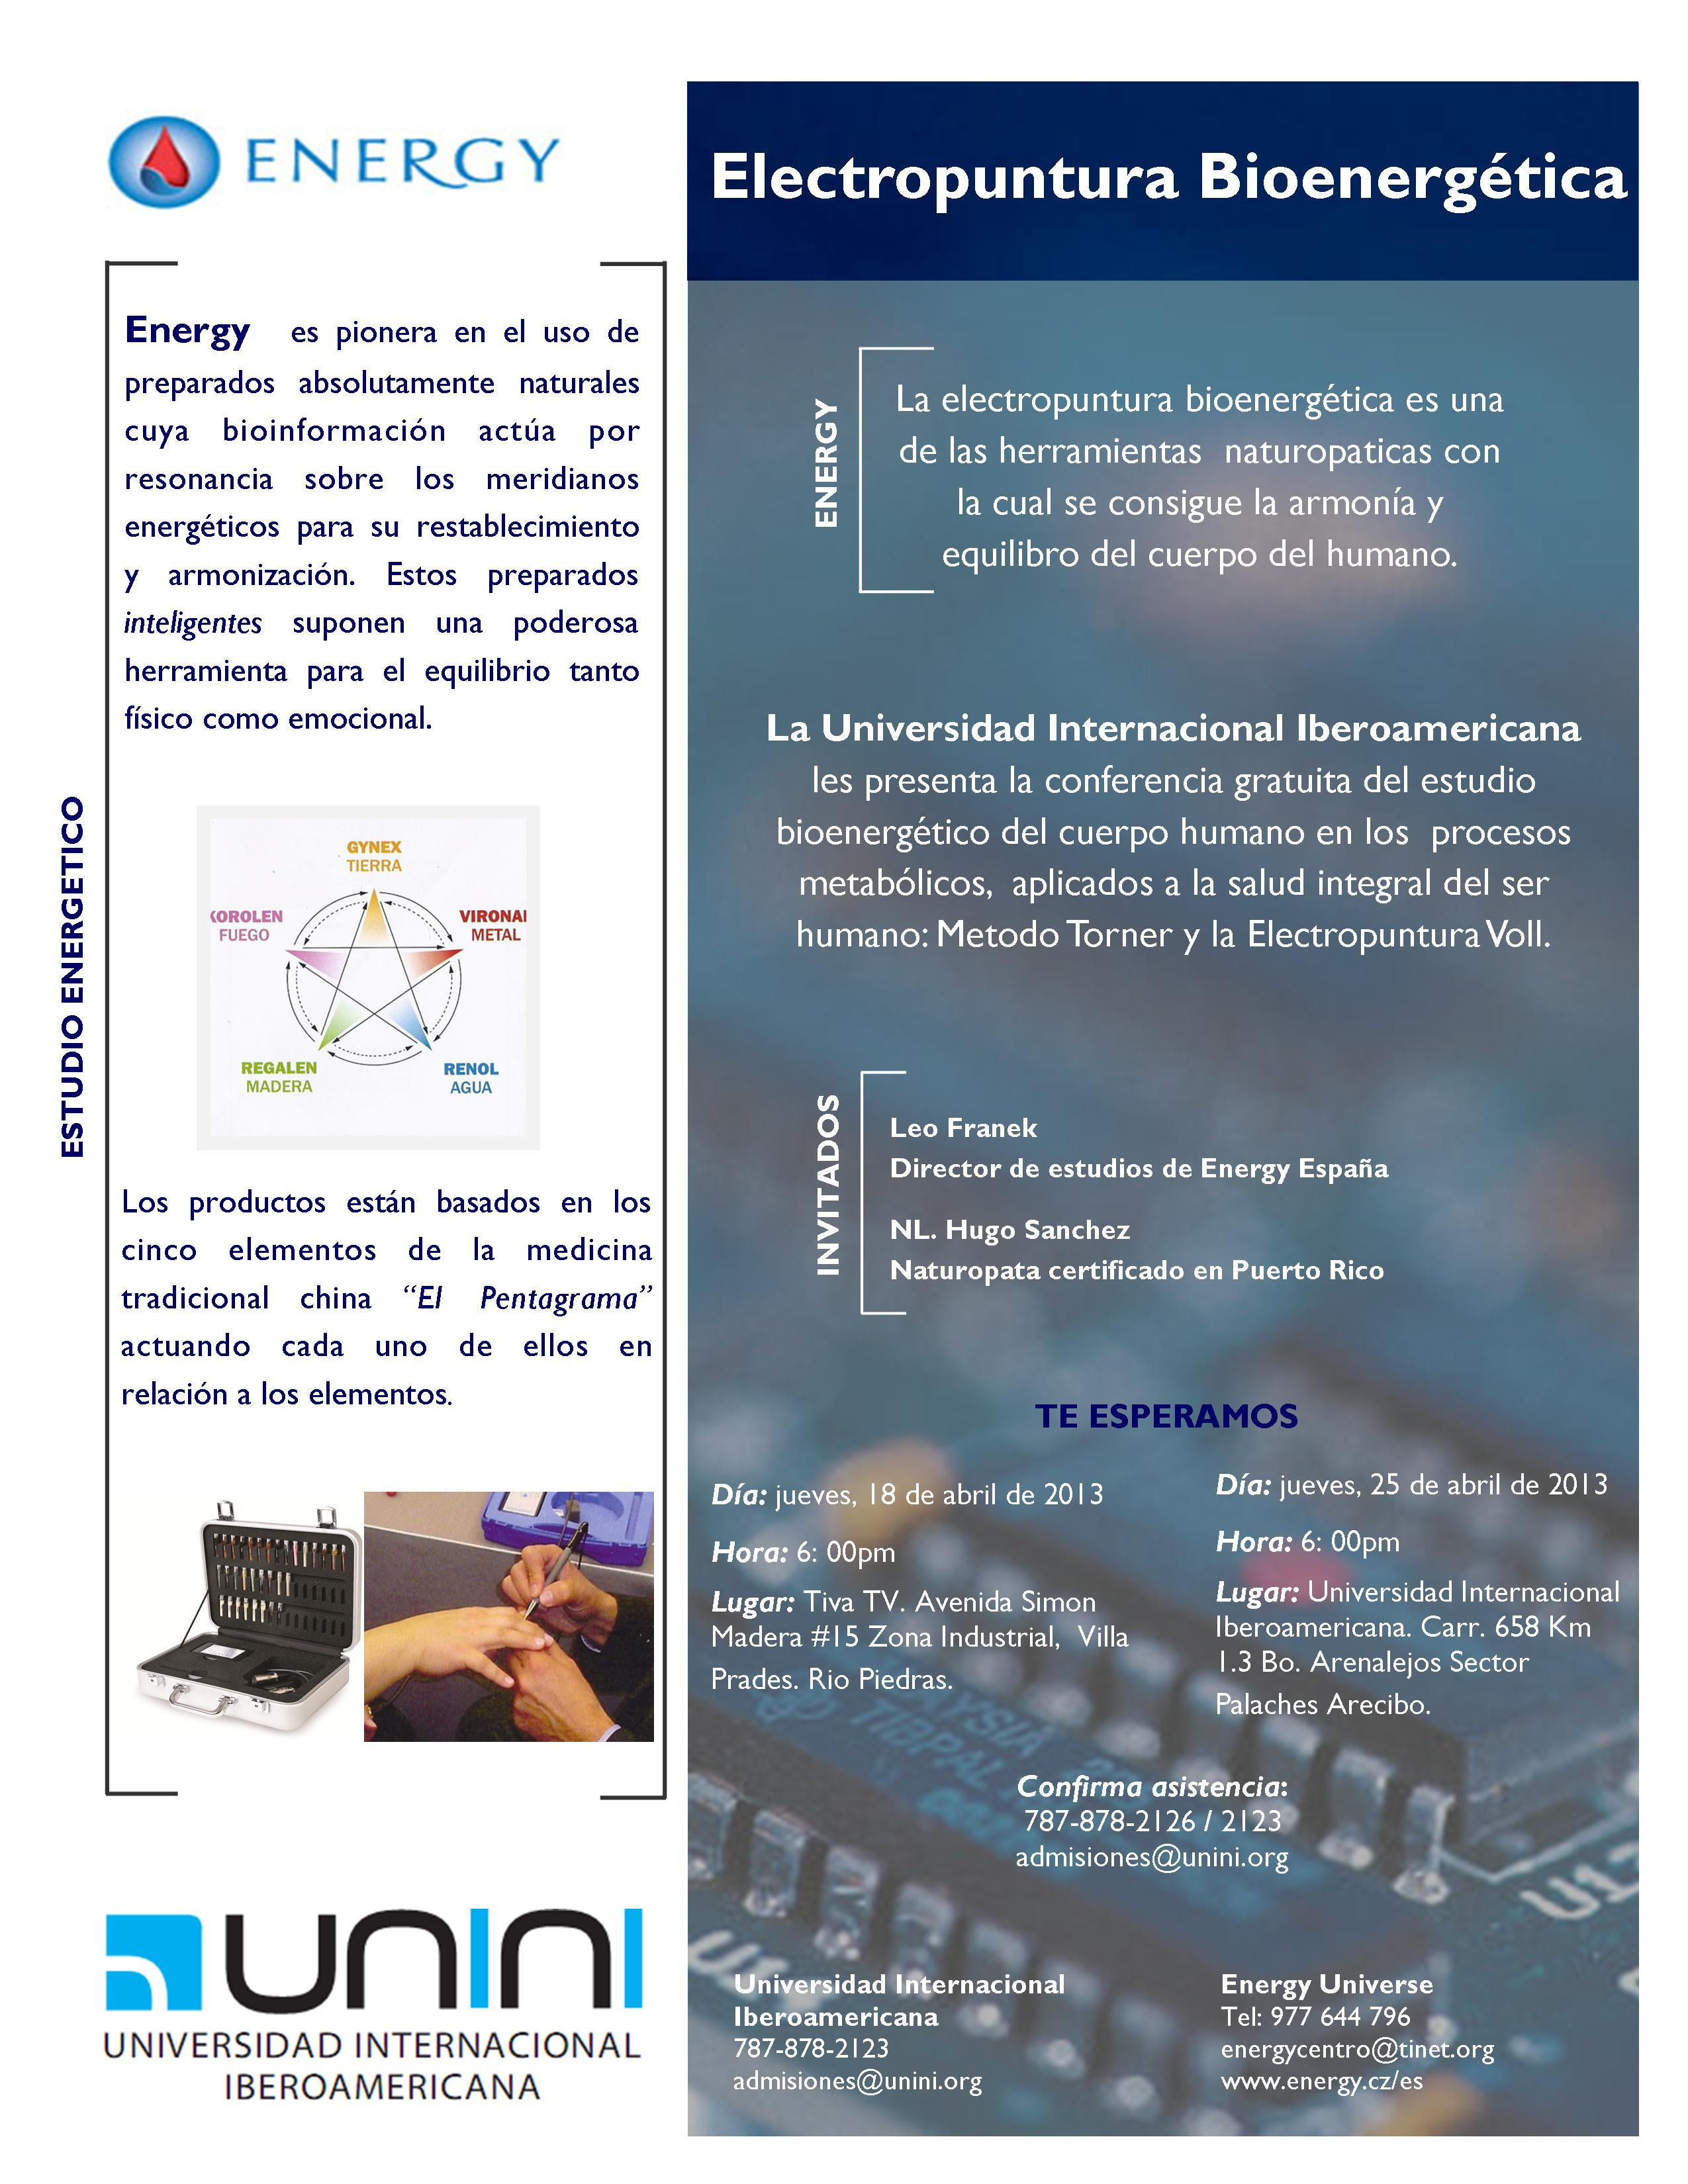 Electropuntura Bioenergética